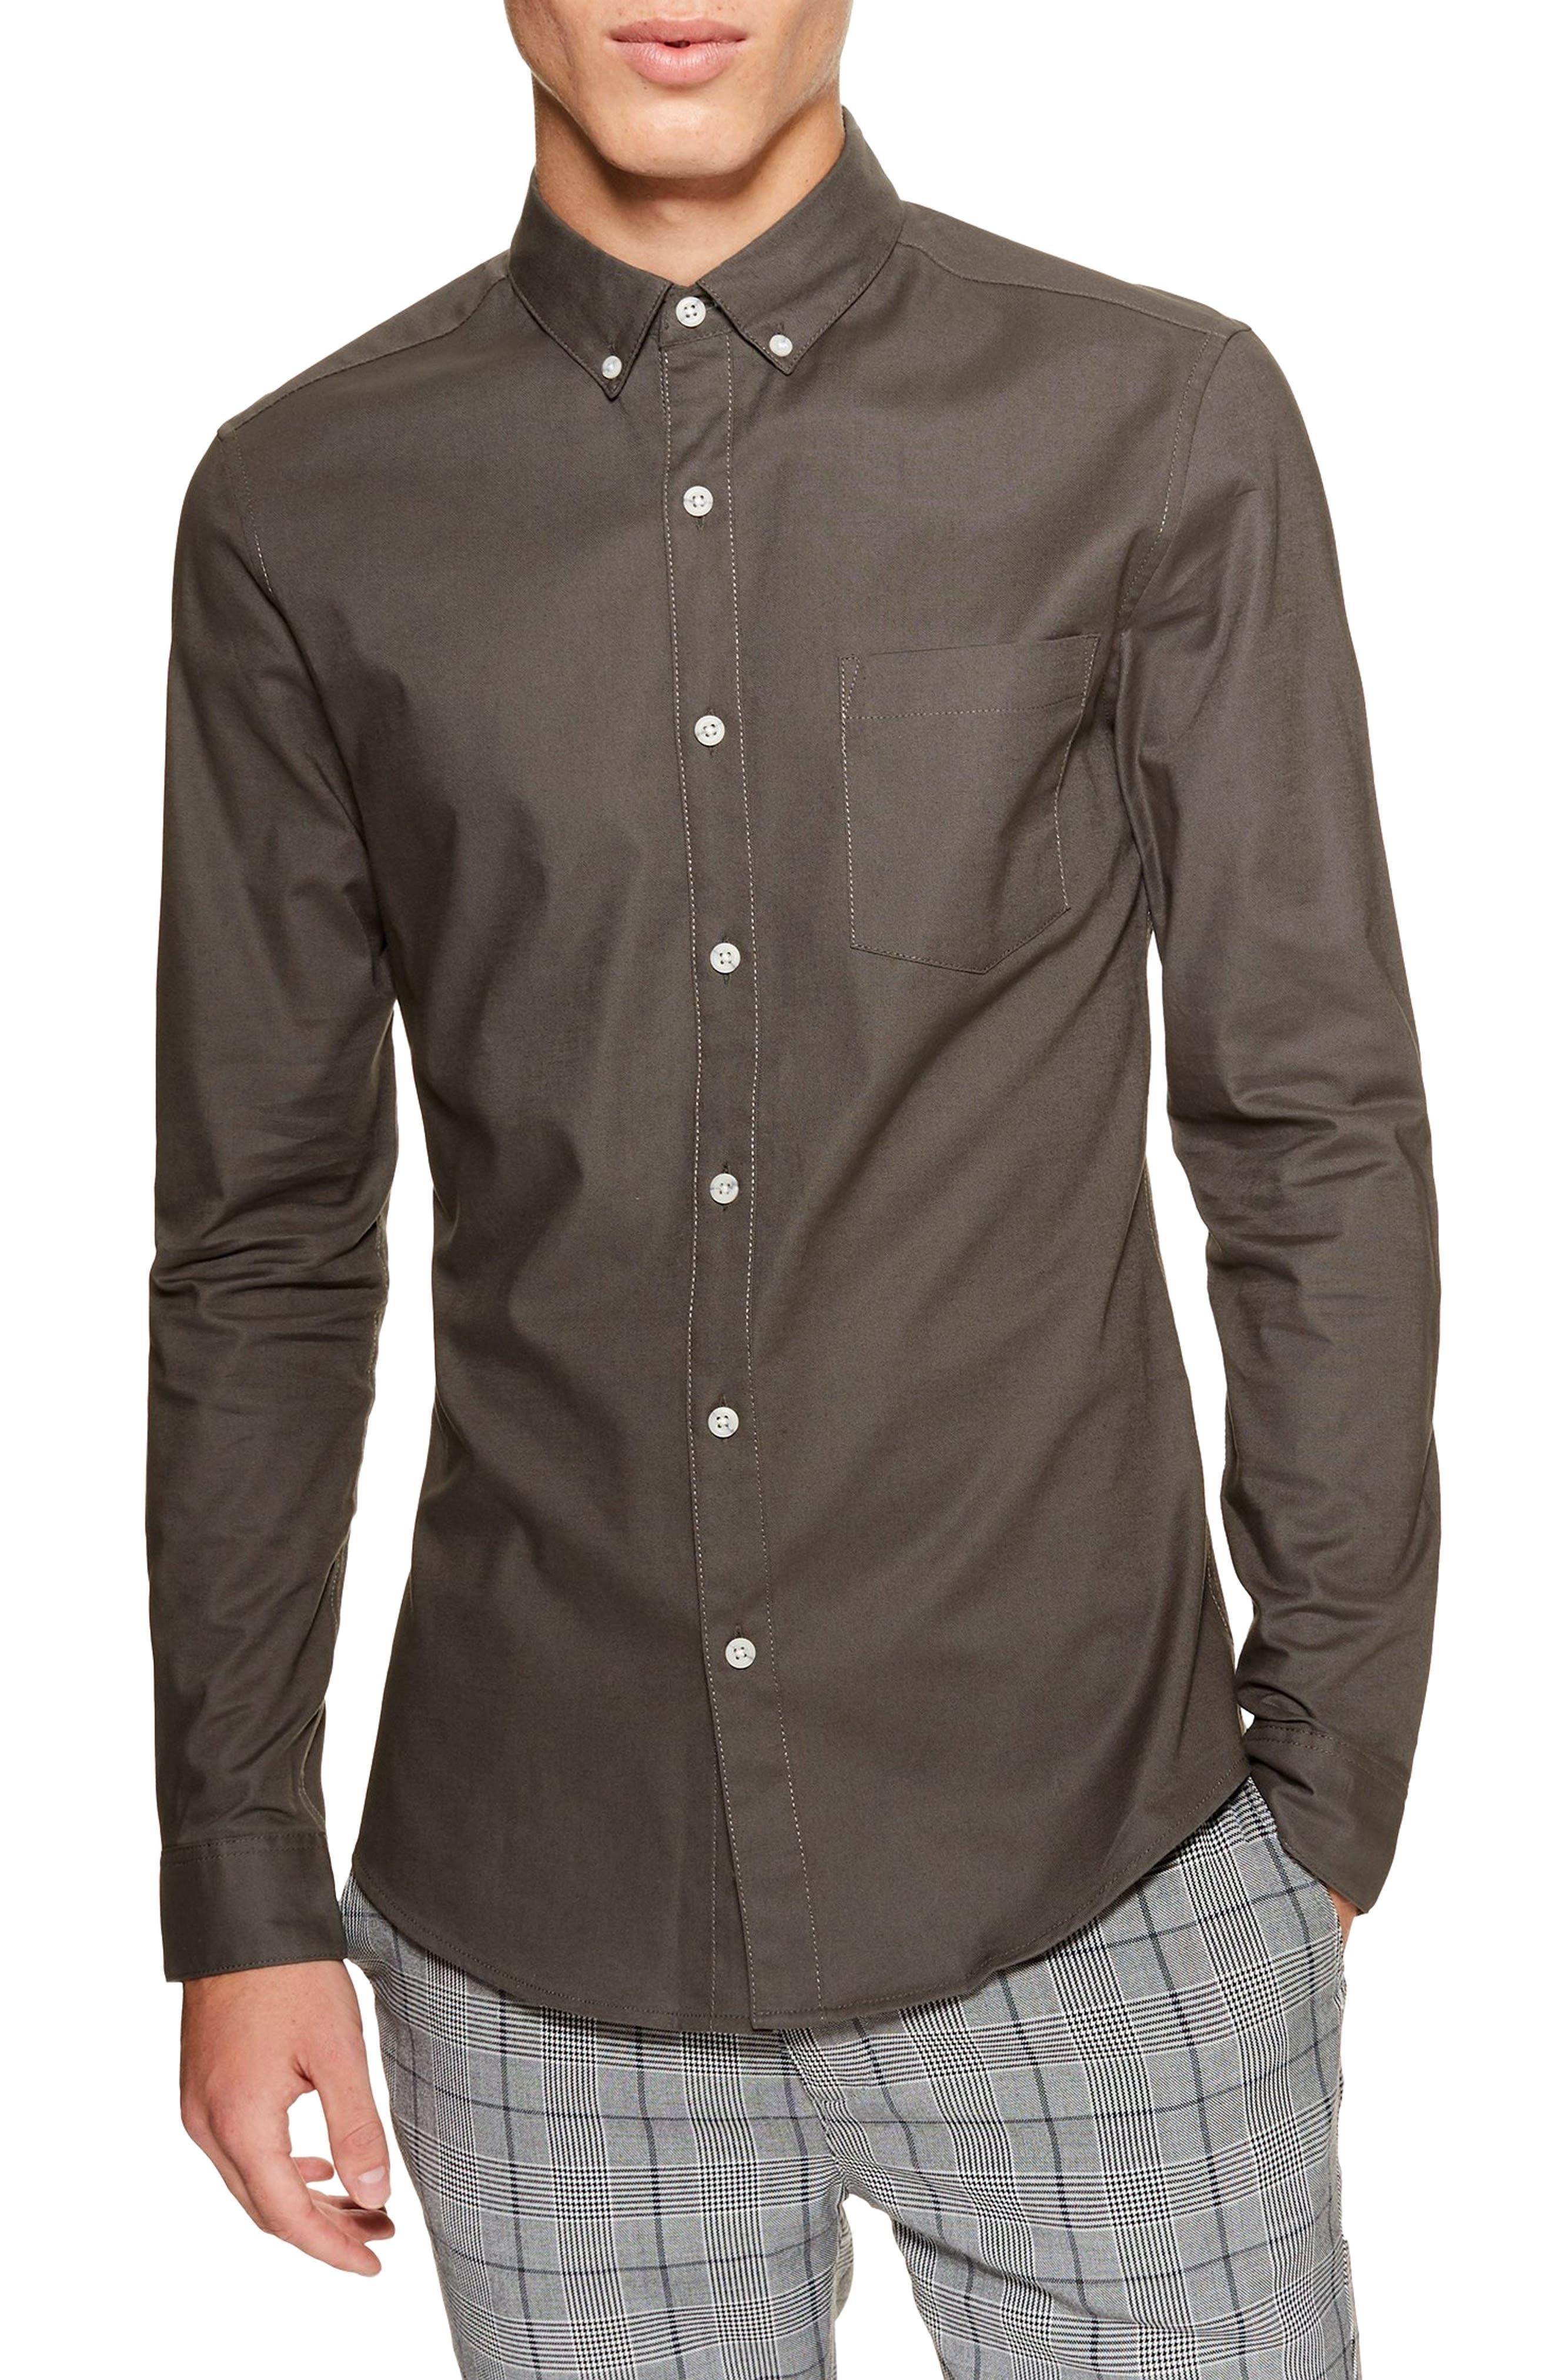 Classic Fit Oxford Shirt,                             Main thumbnail 1, color,                             GREY